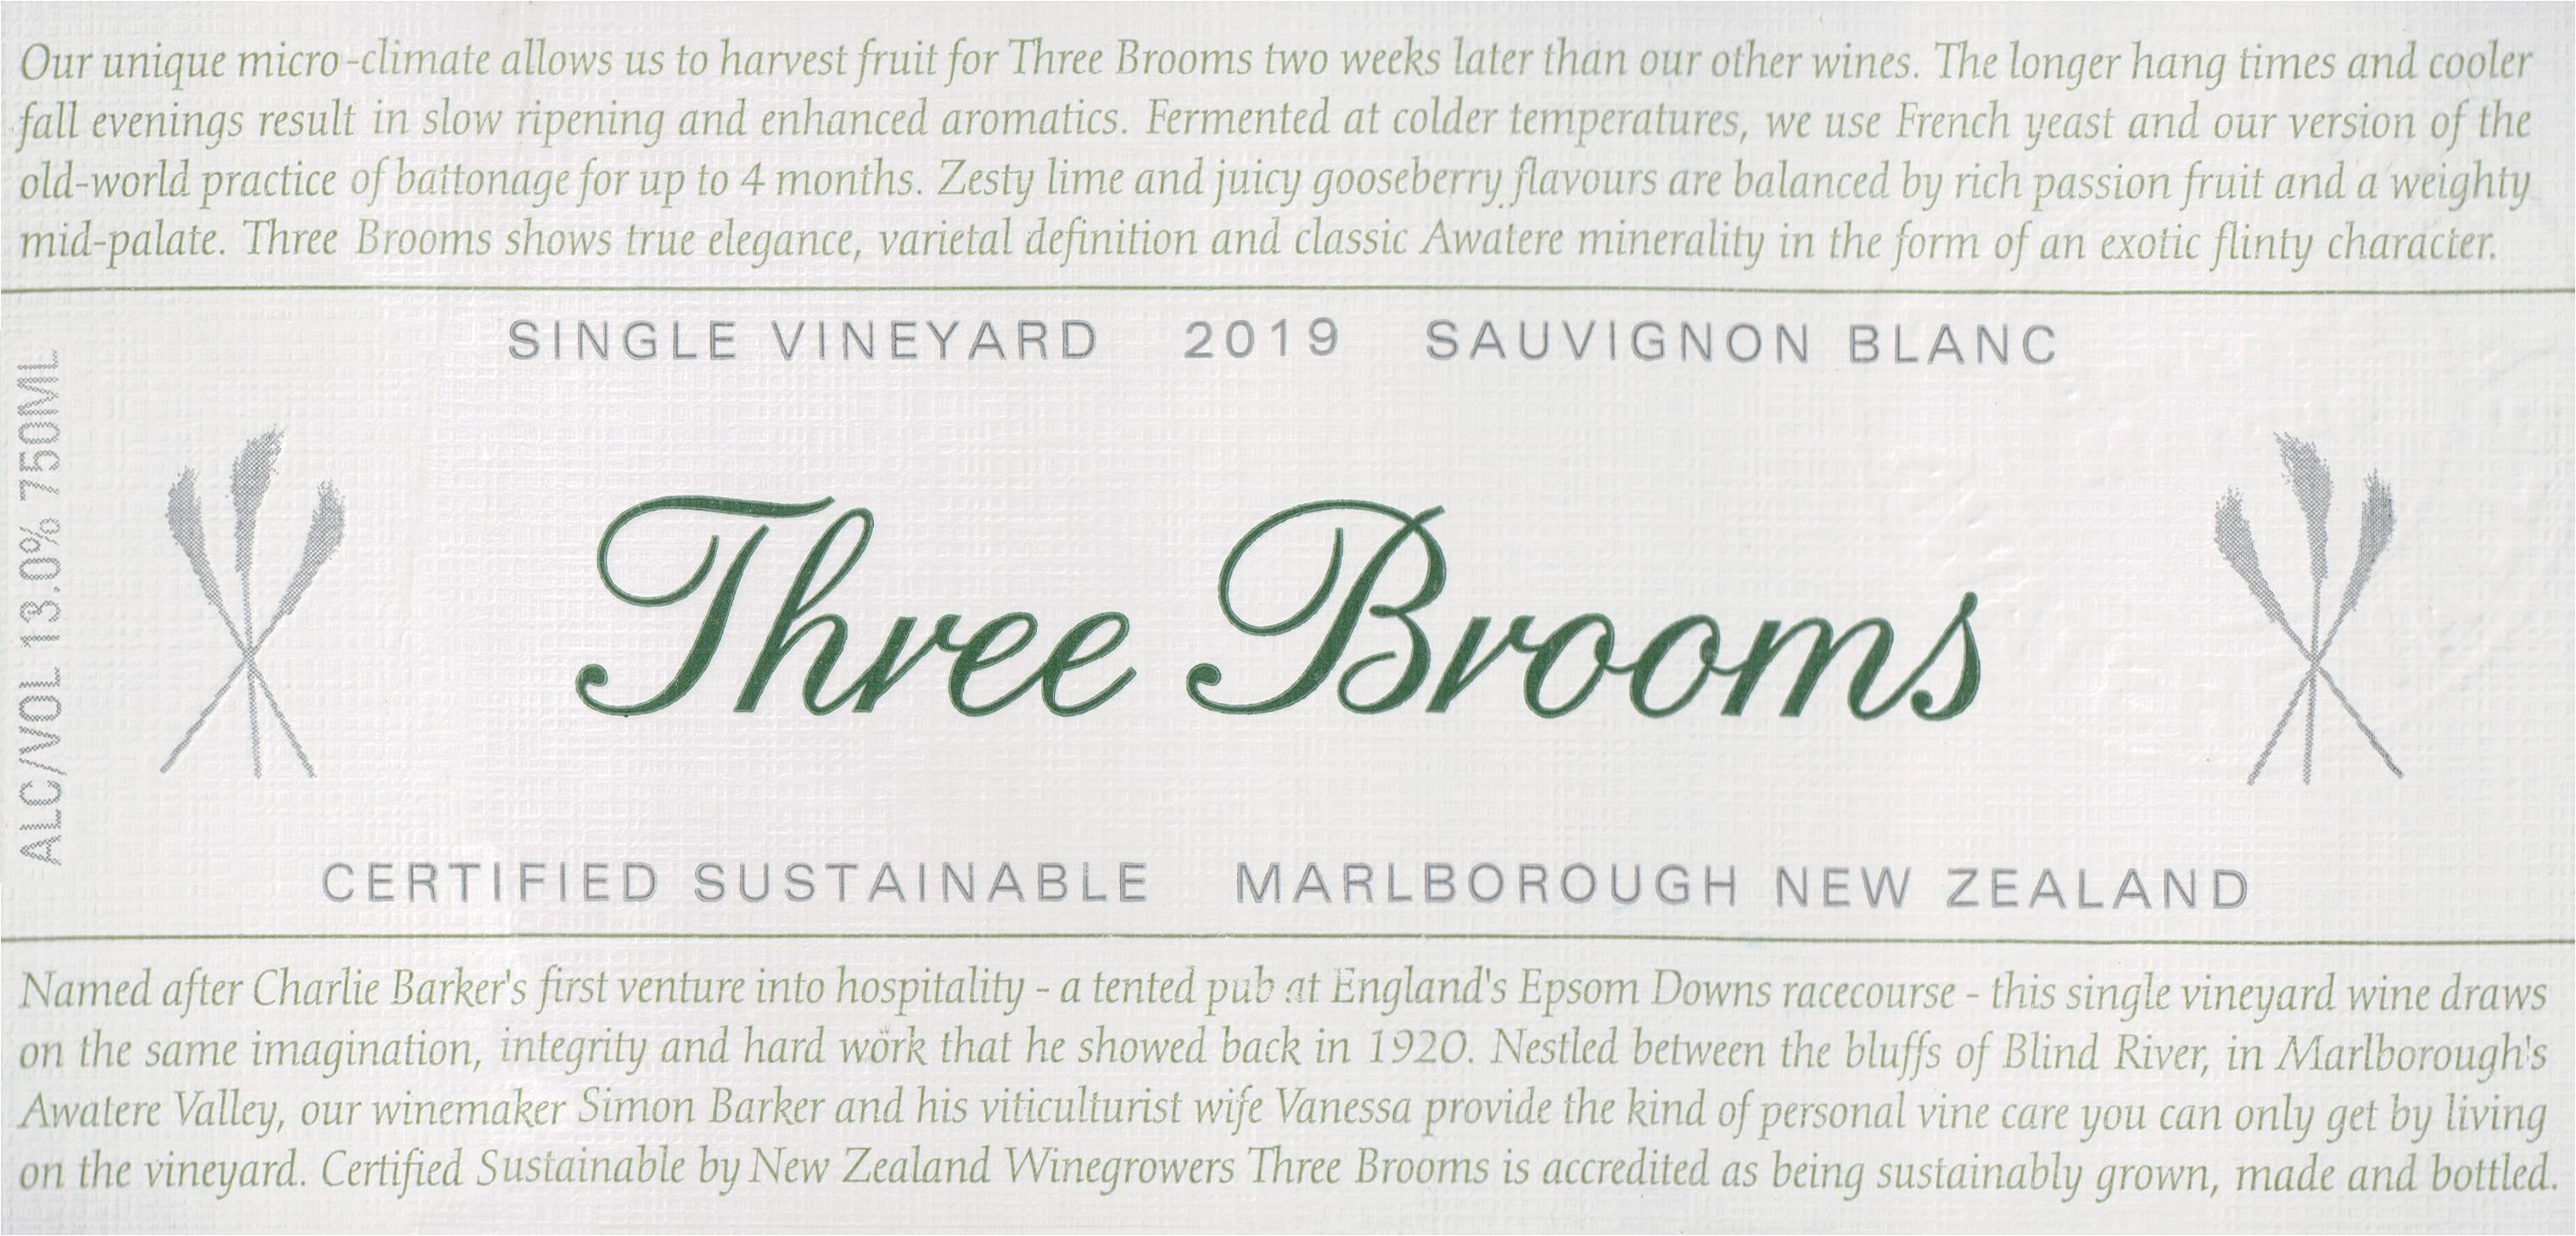 Three Brooms Sauvignon Blanc 2019